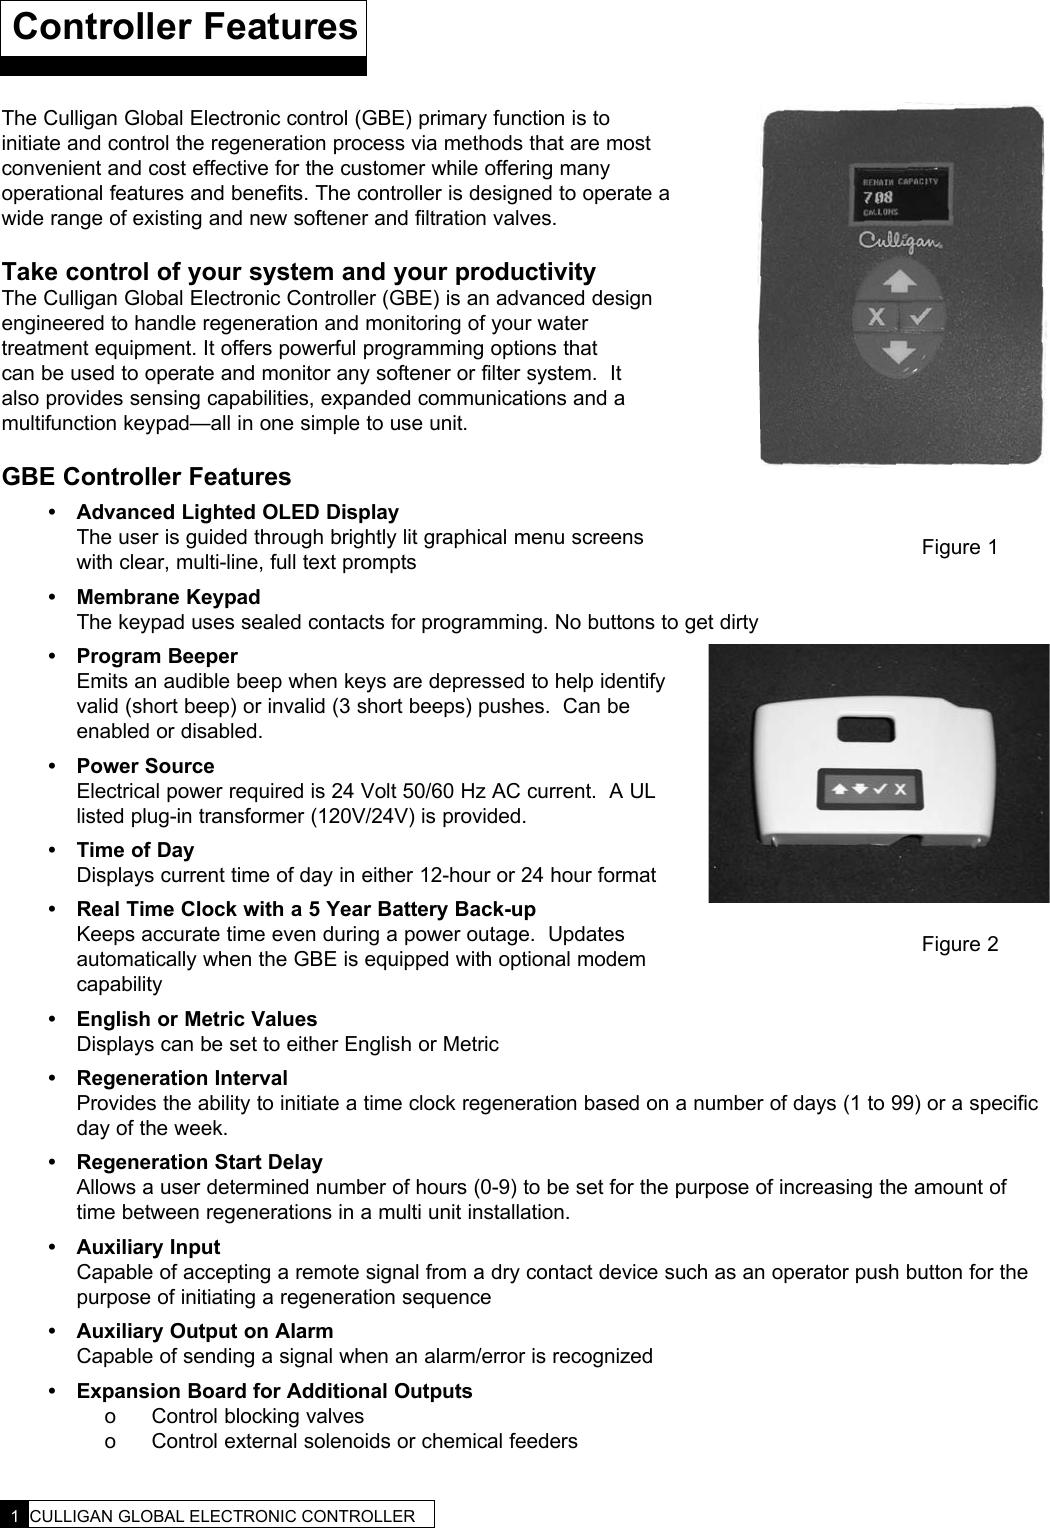 culligan water softener instruction manual